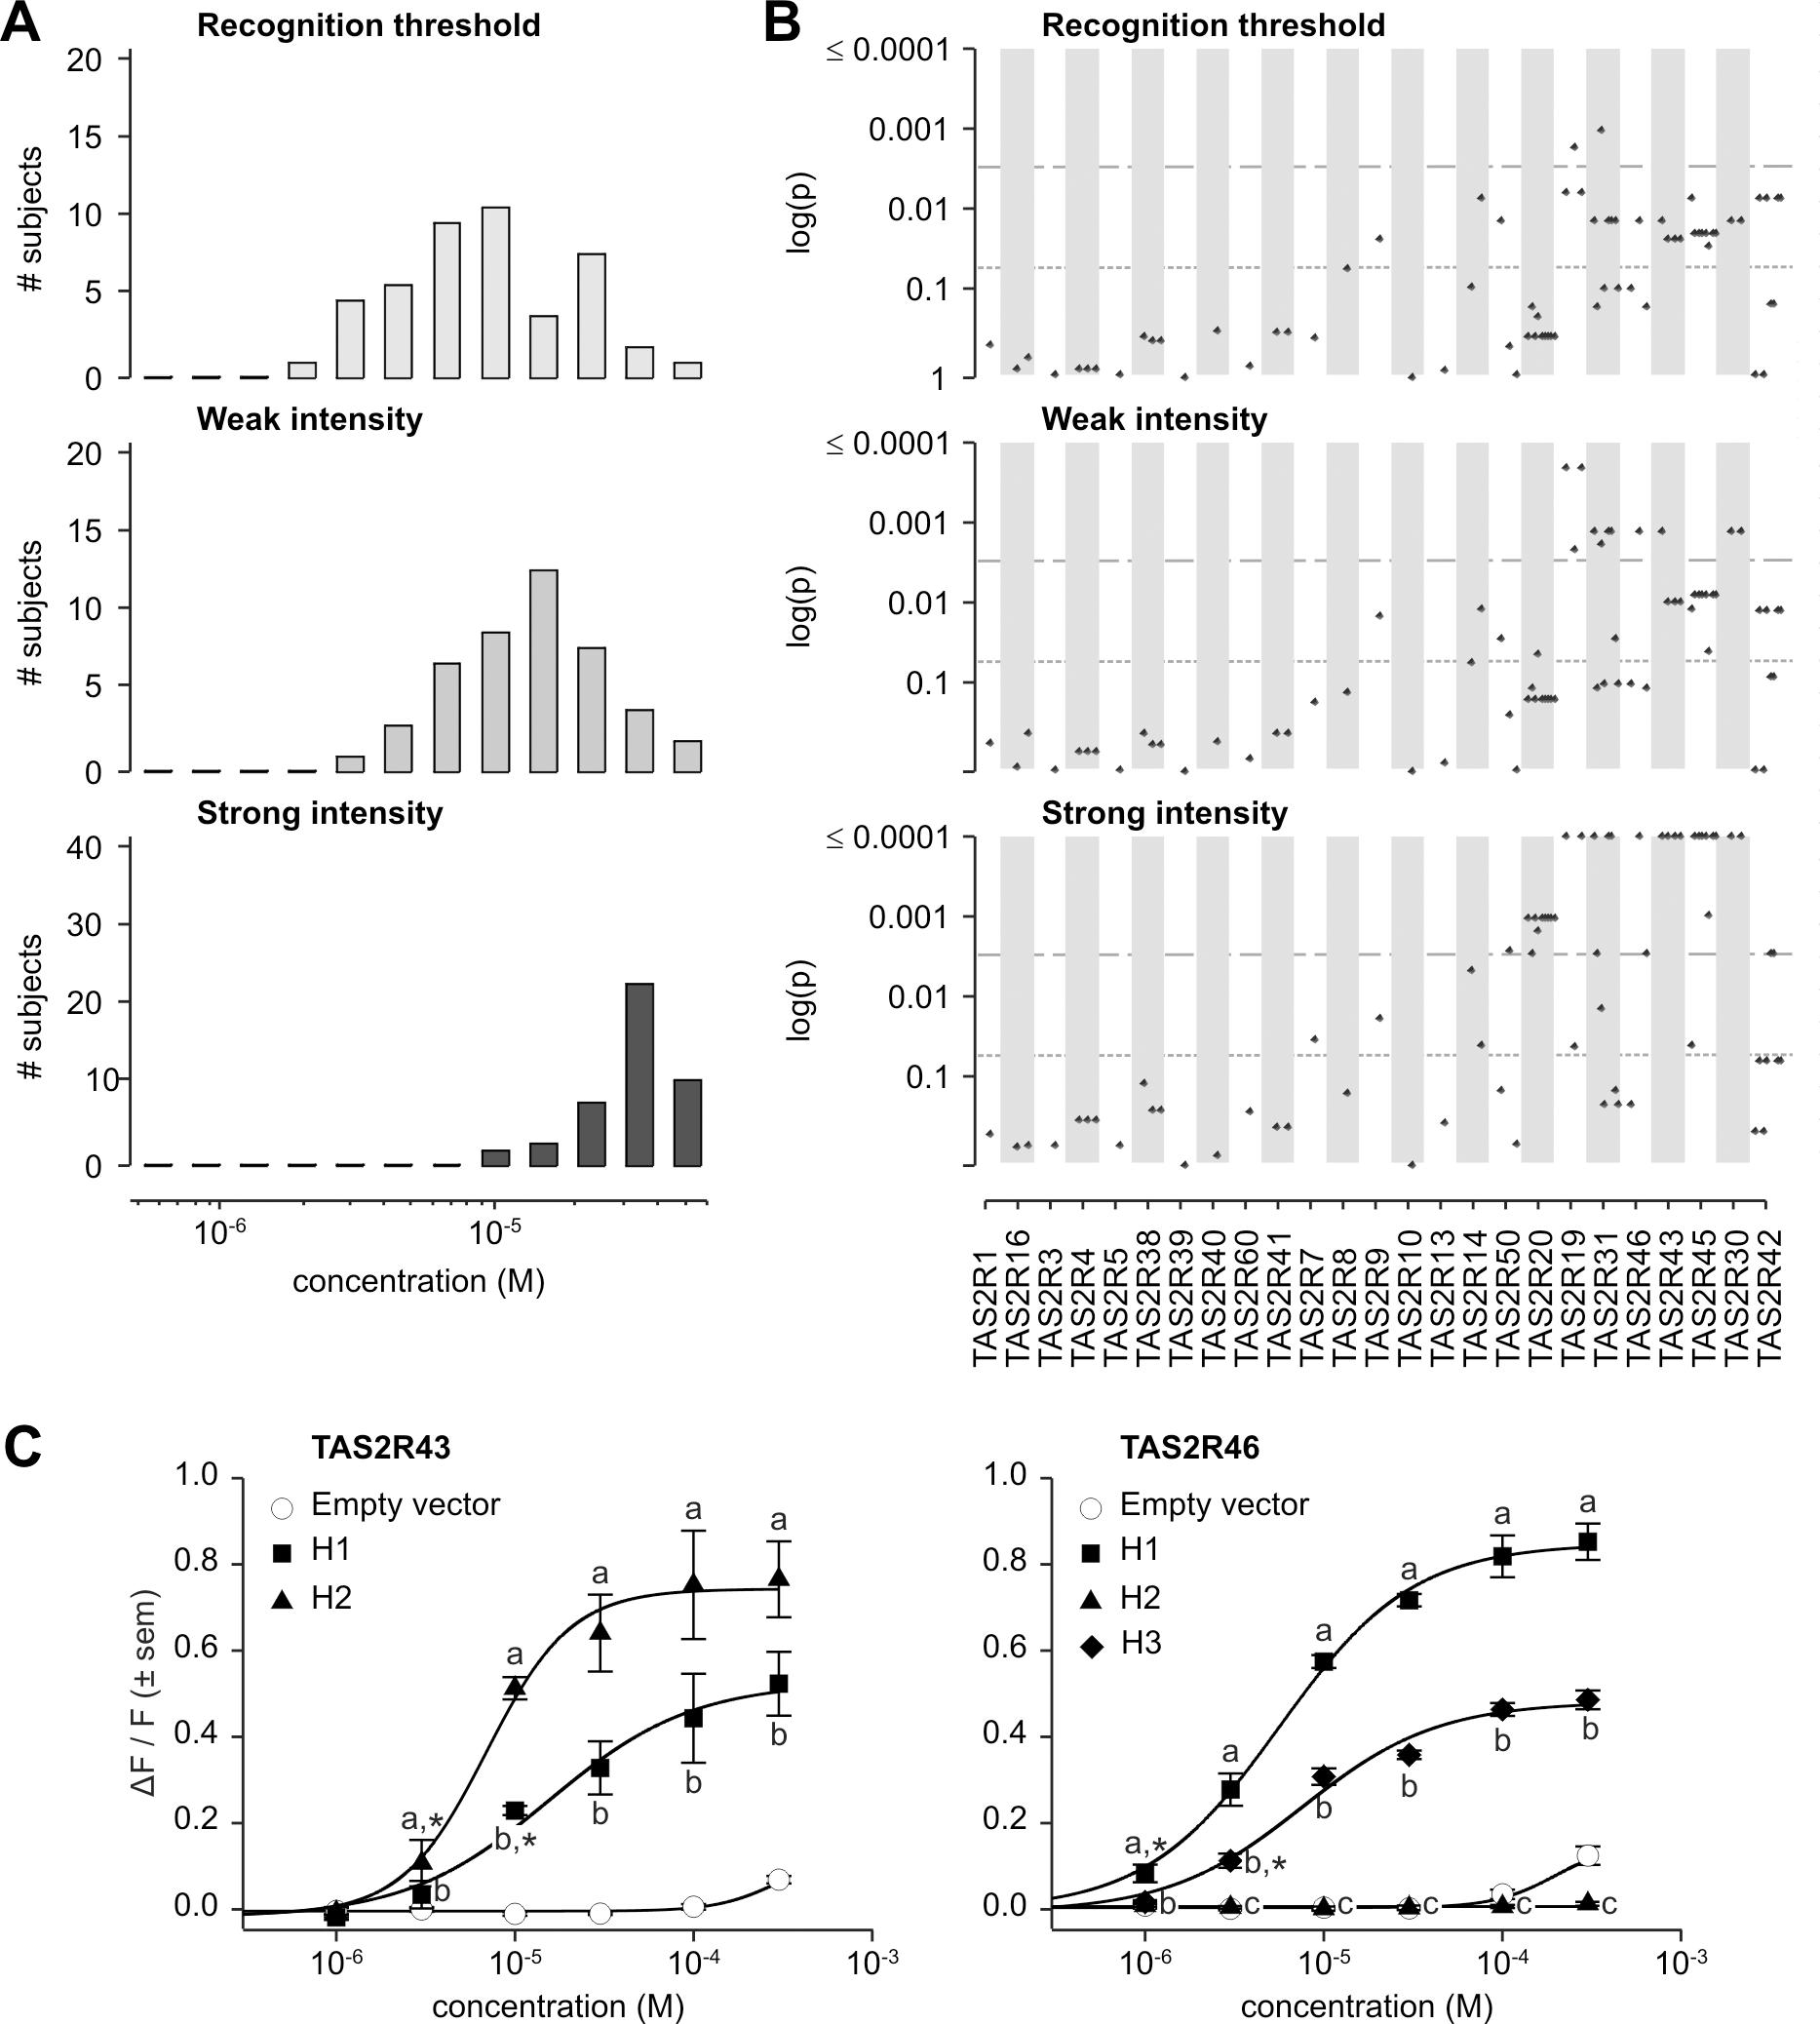 Grosheimin phenotypes, genotype-phenotype associations, and functional assays.